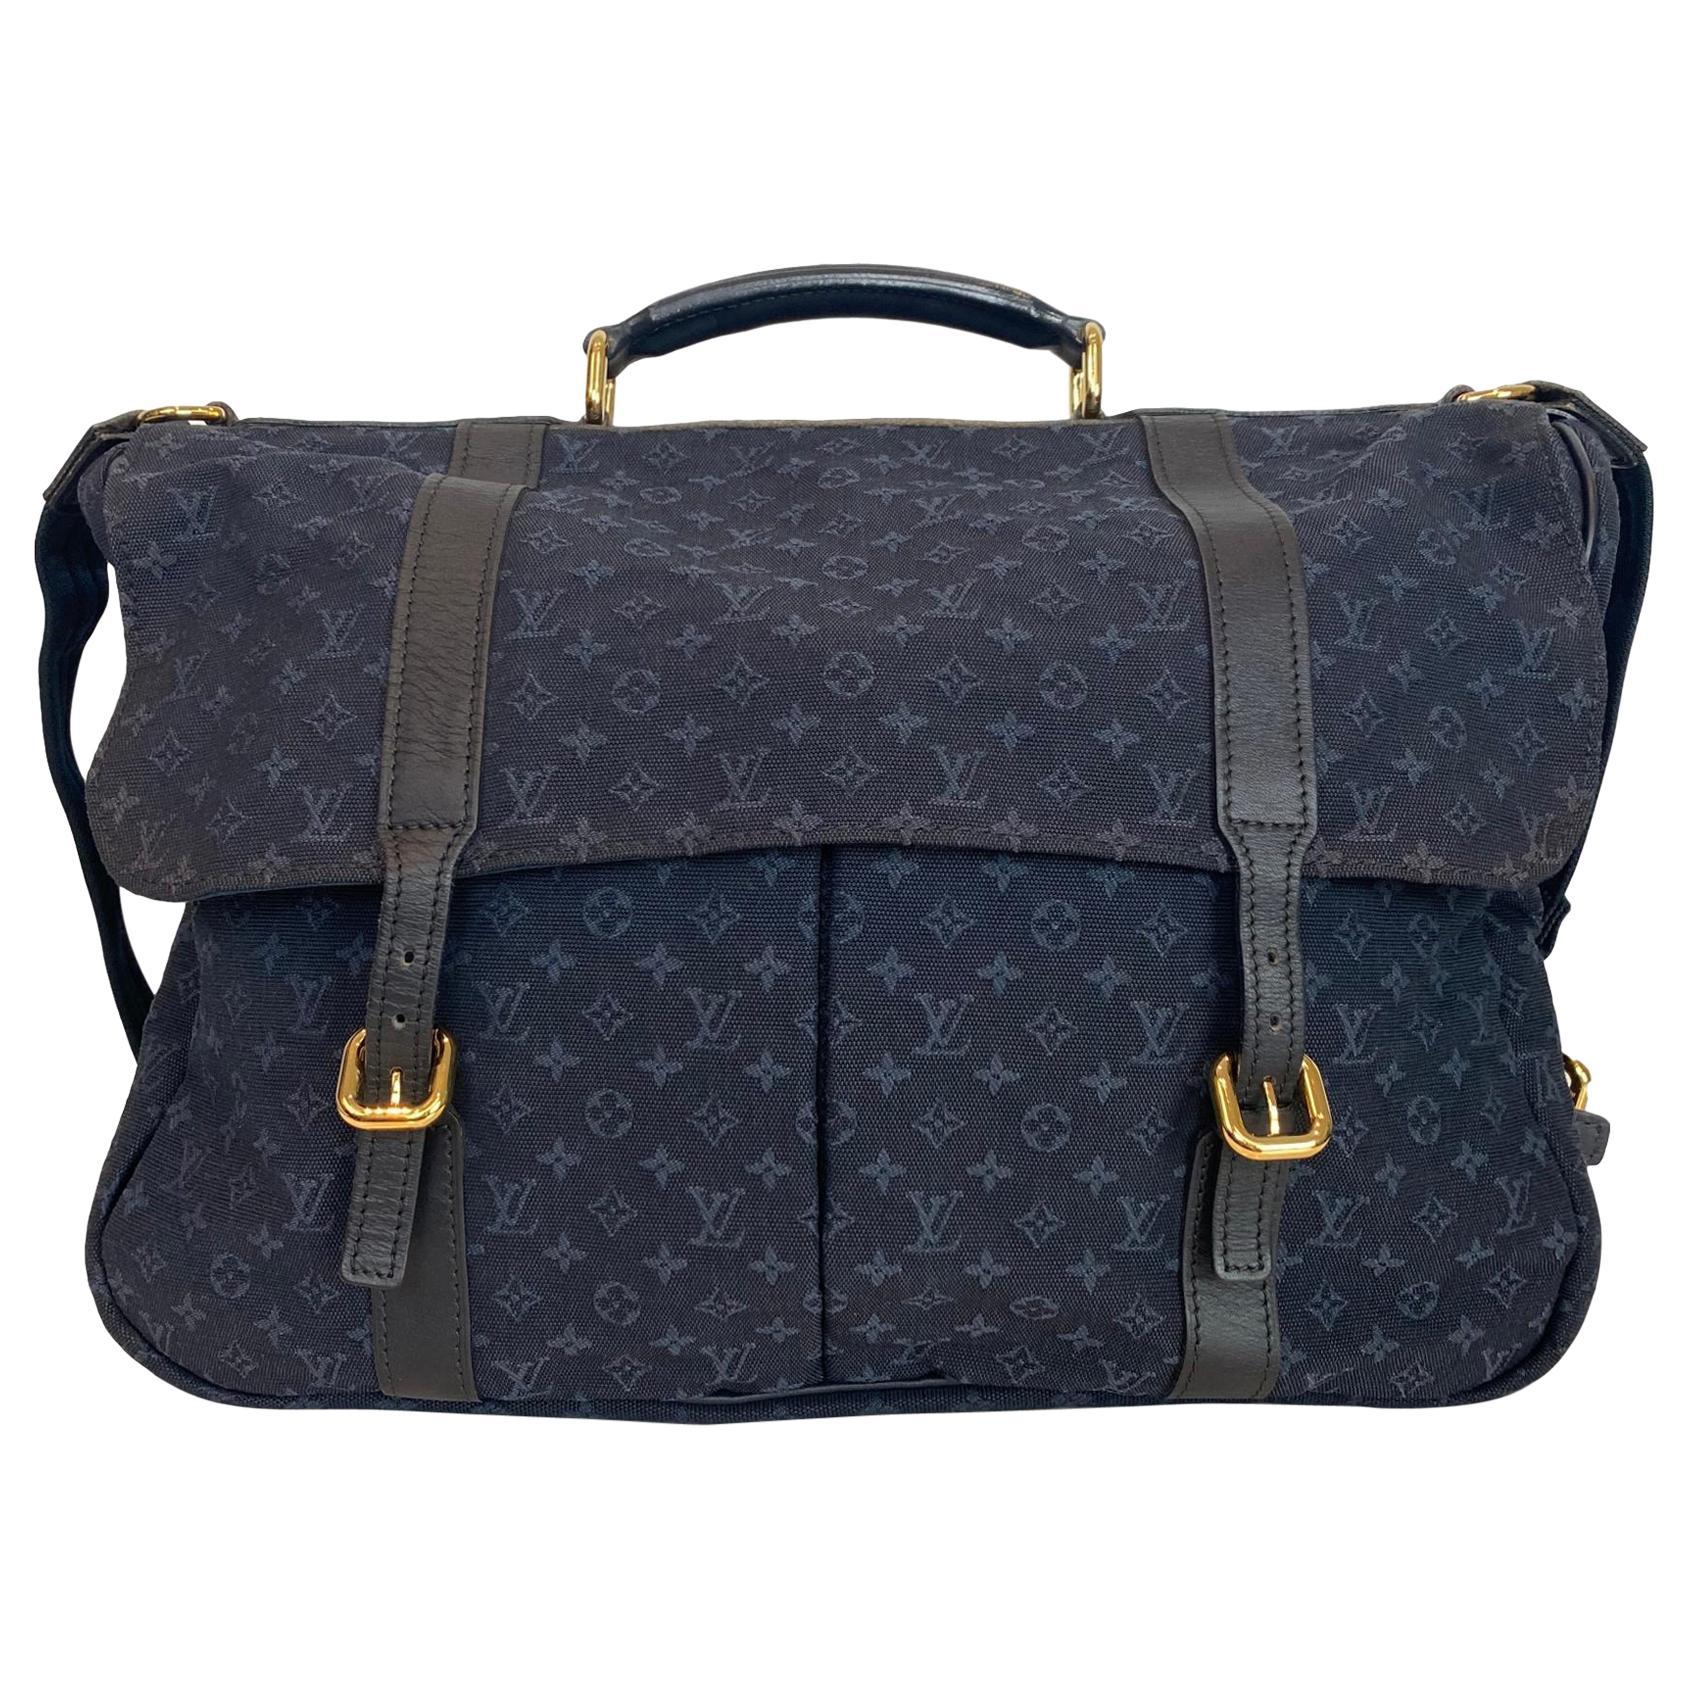 Louis Vuitton Denise Messenger Shoulder Bag in Monogram Idylle, France 2002.